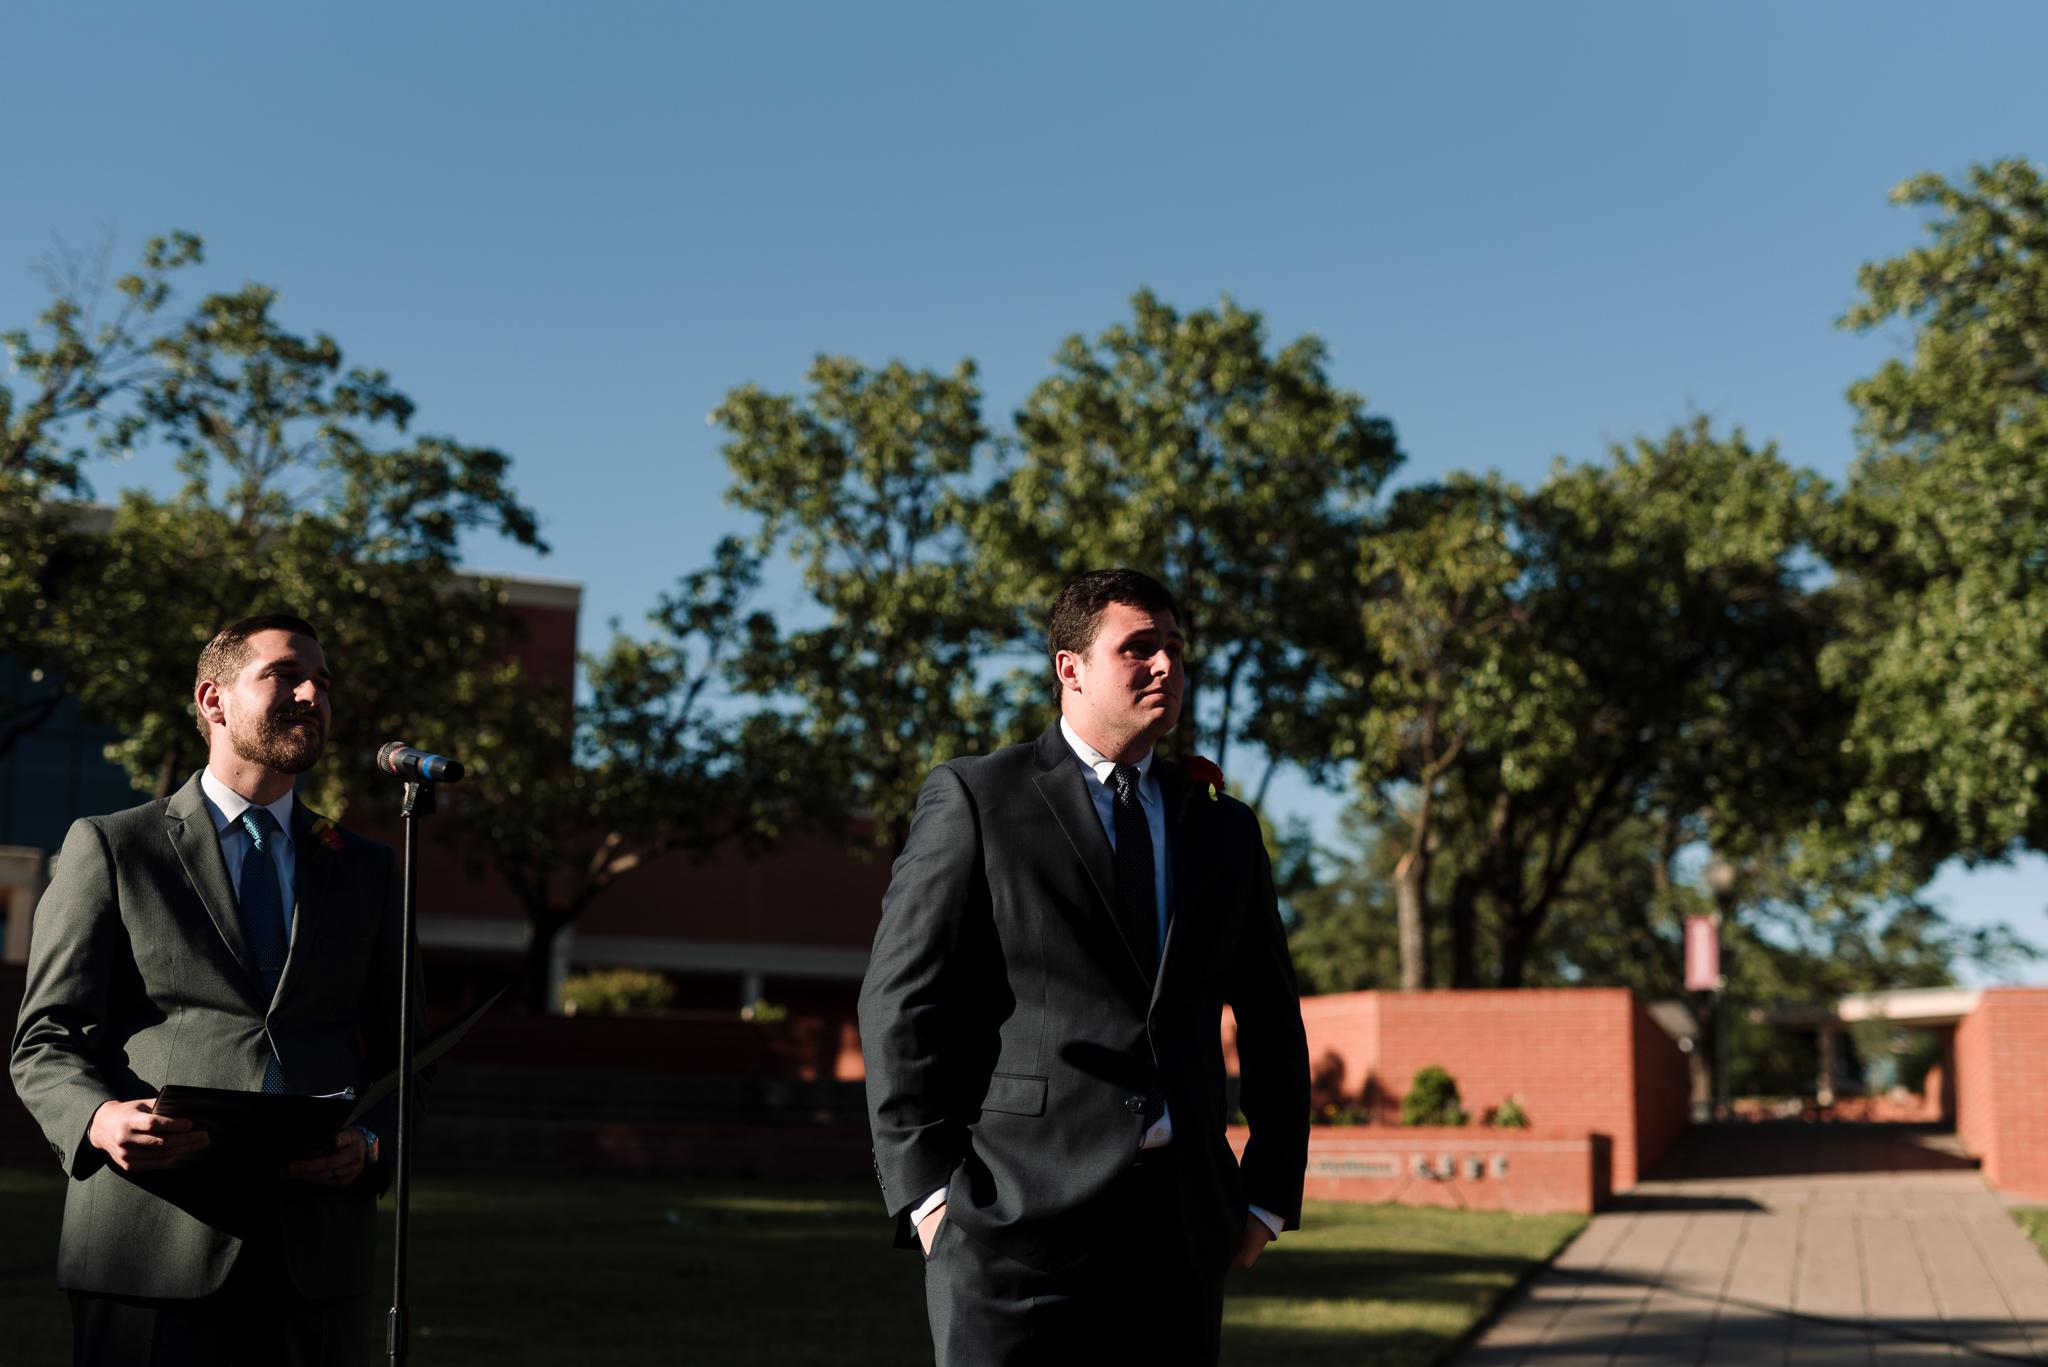 Oklahoma-Christian-University-Wedding-8162.jpg